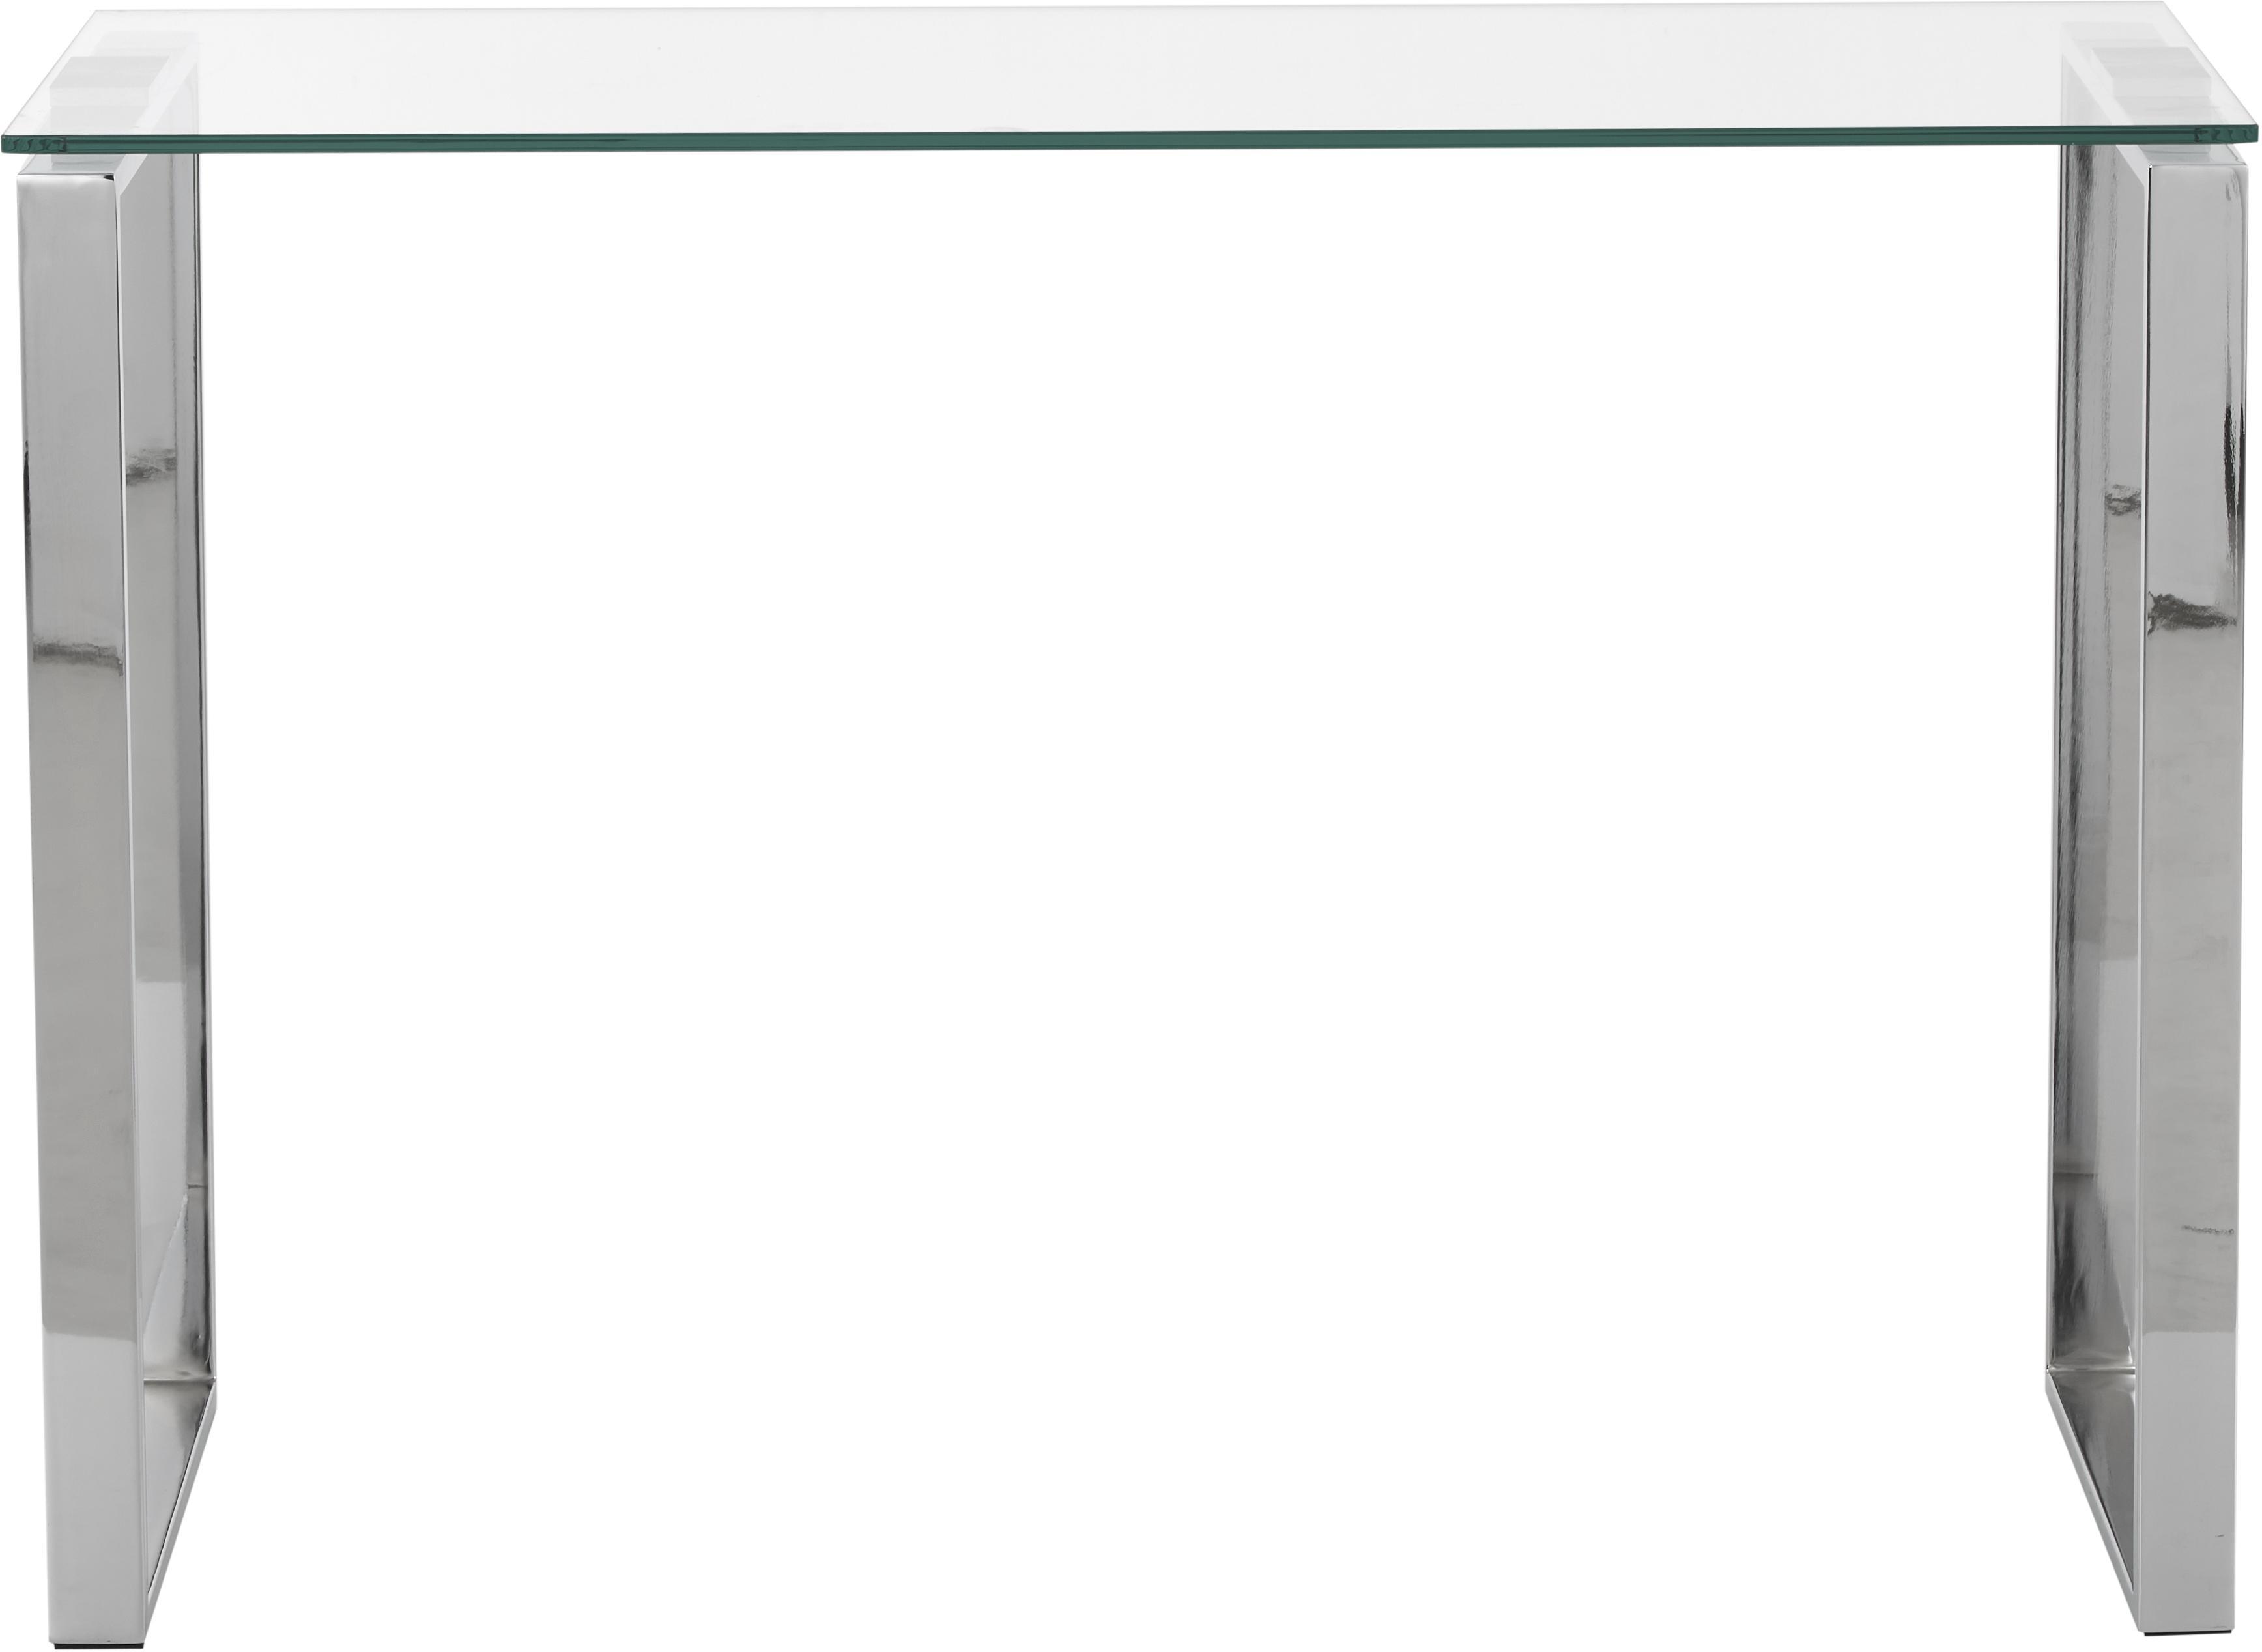 Glas-Konsole Katrine mit silberfarbenen Gestell, Hartglas, Metall, Transparent, 110 x 76 cm